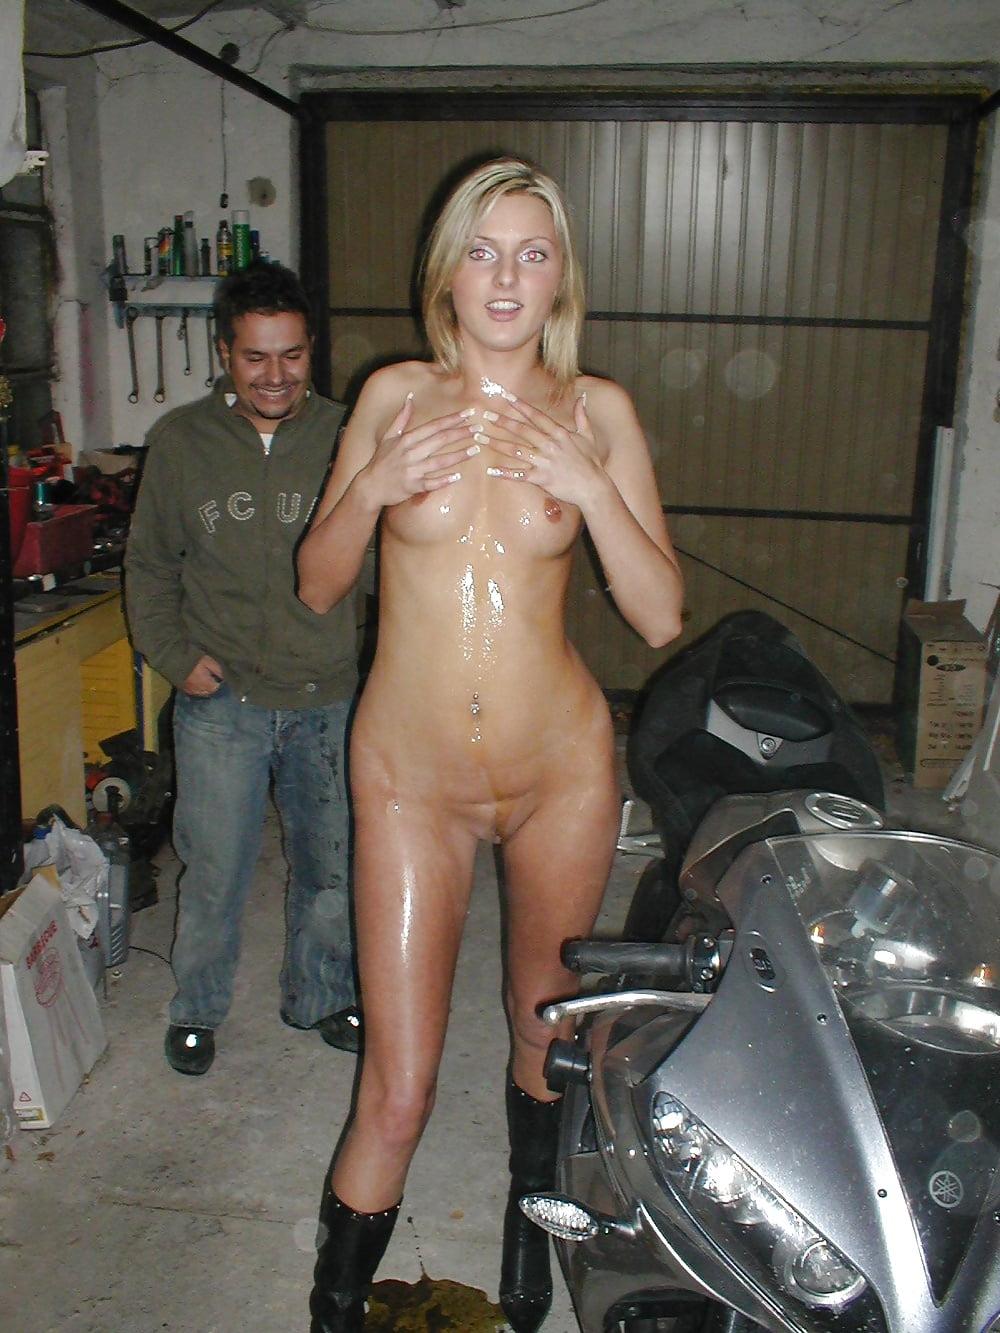 Rathbone fake sturgis naked biker bitch efron